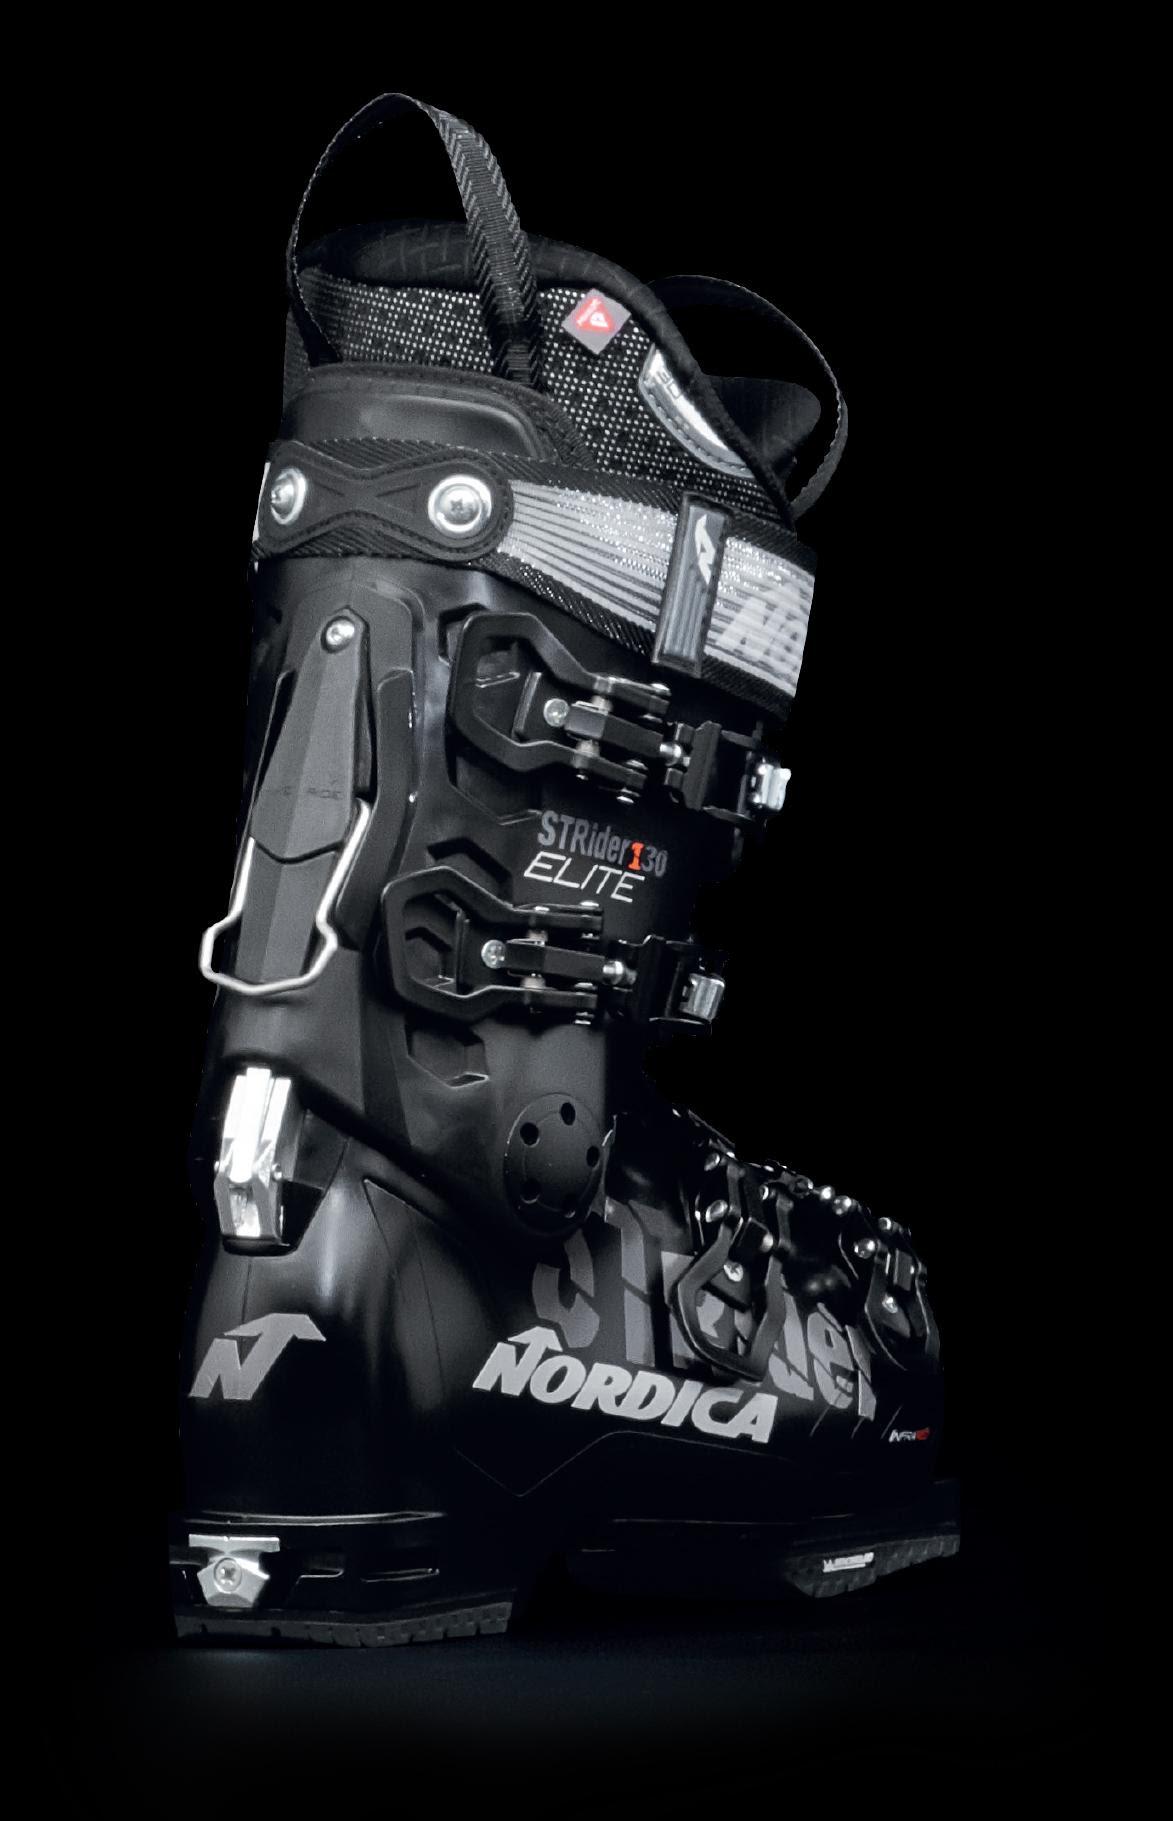 Nordica Strider Elite 130